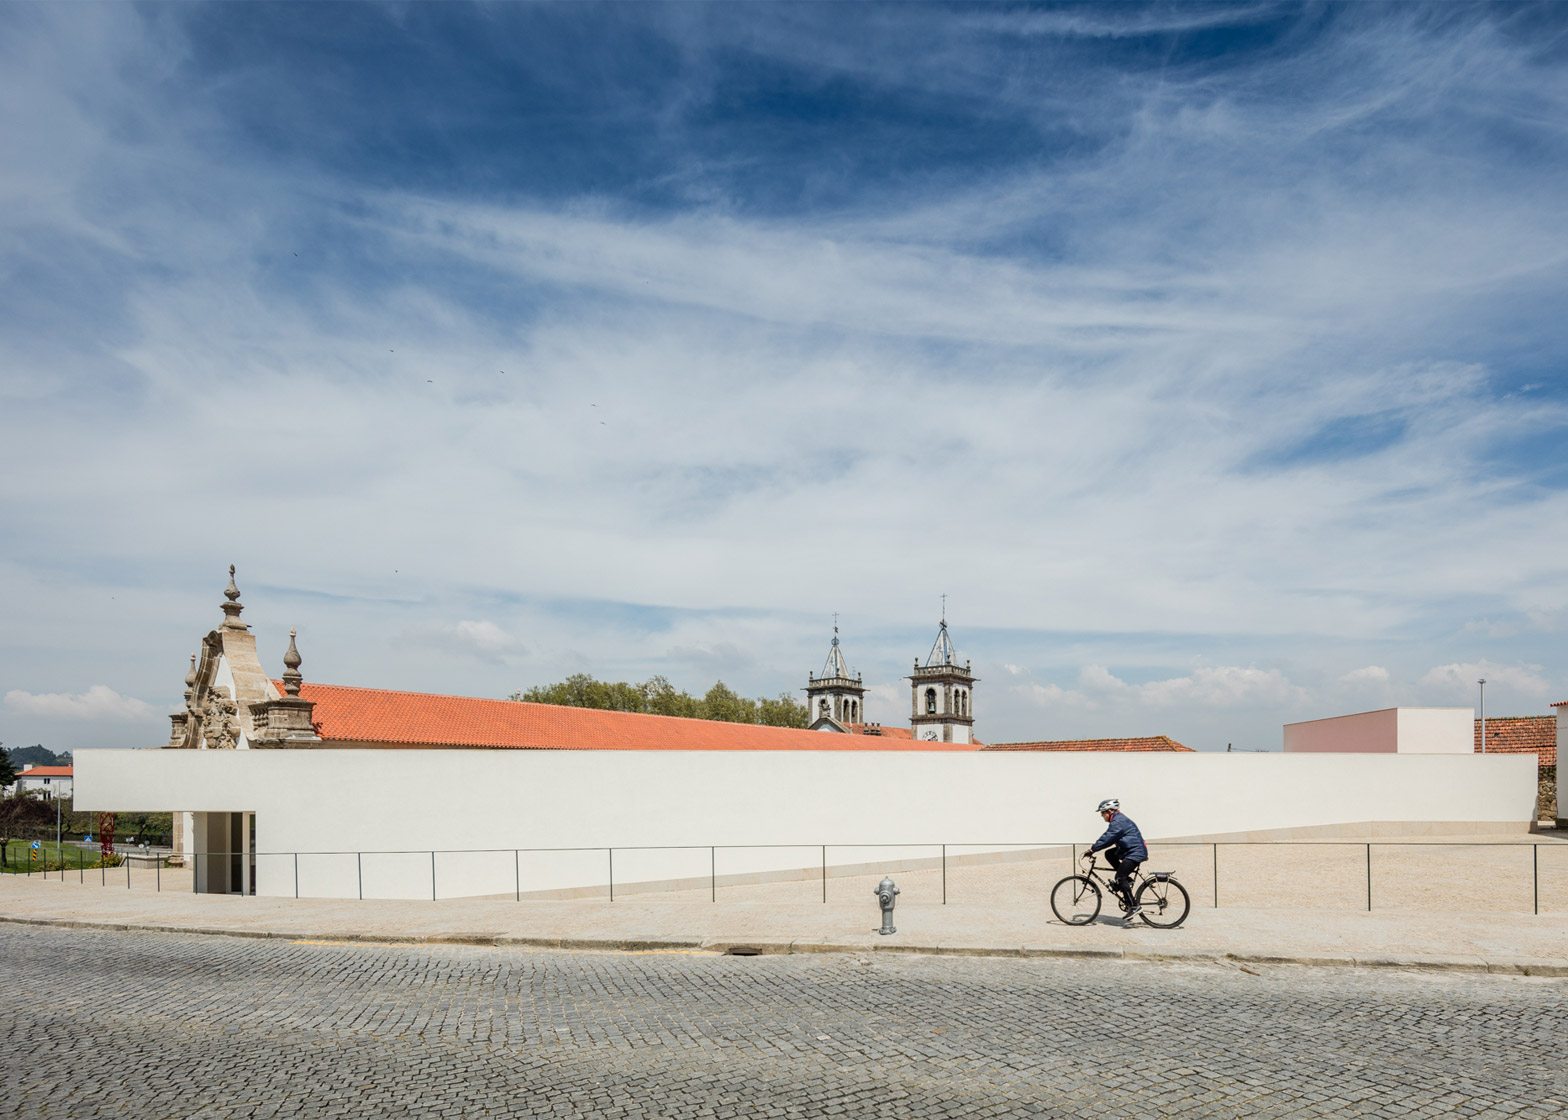 3-premiados-arquitetos-portugueses-se-unem-para-reformar-museu